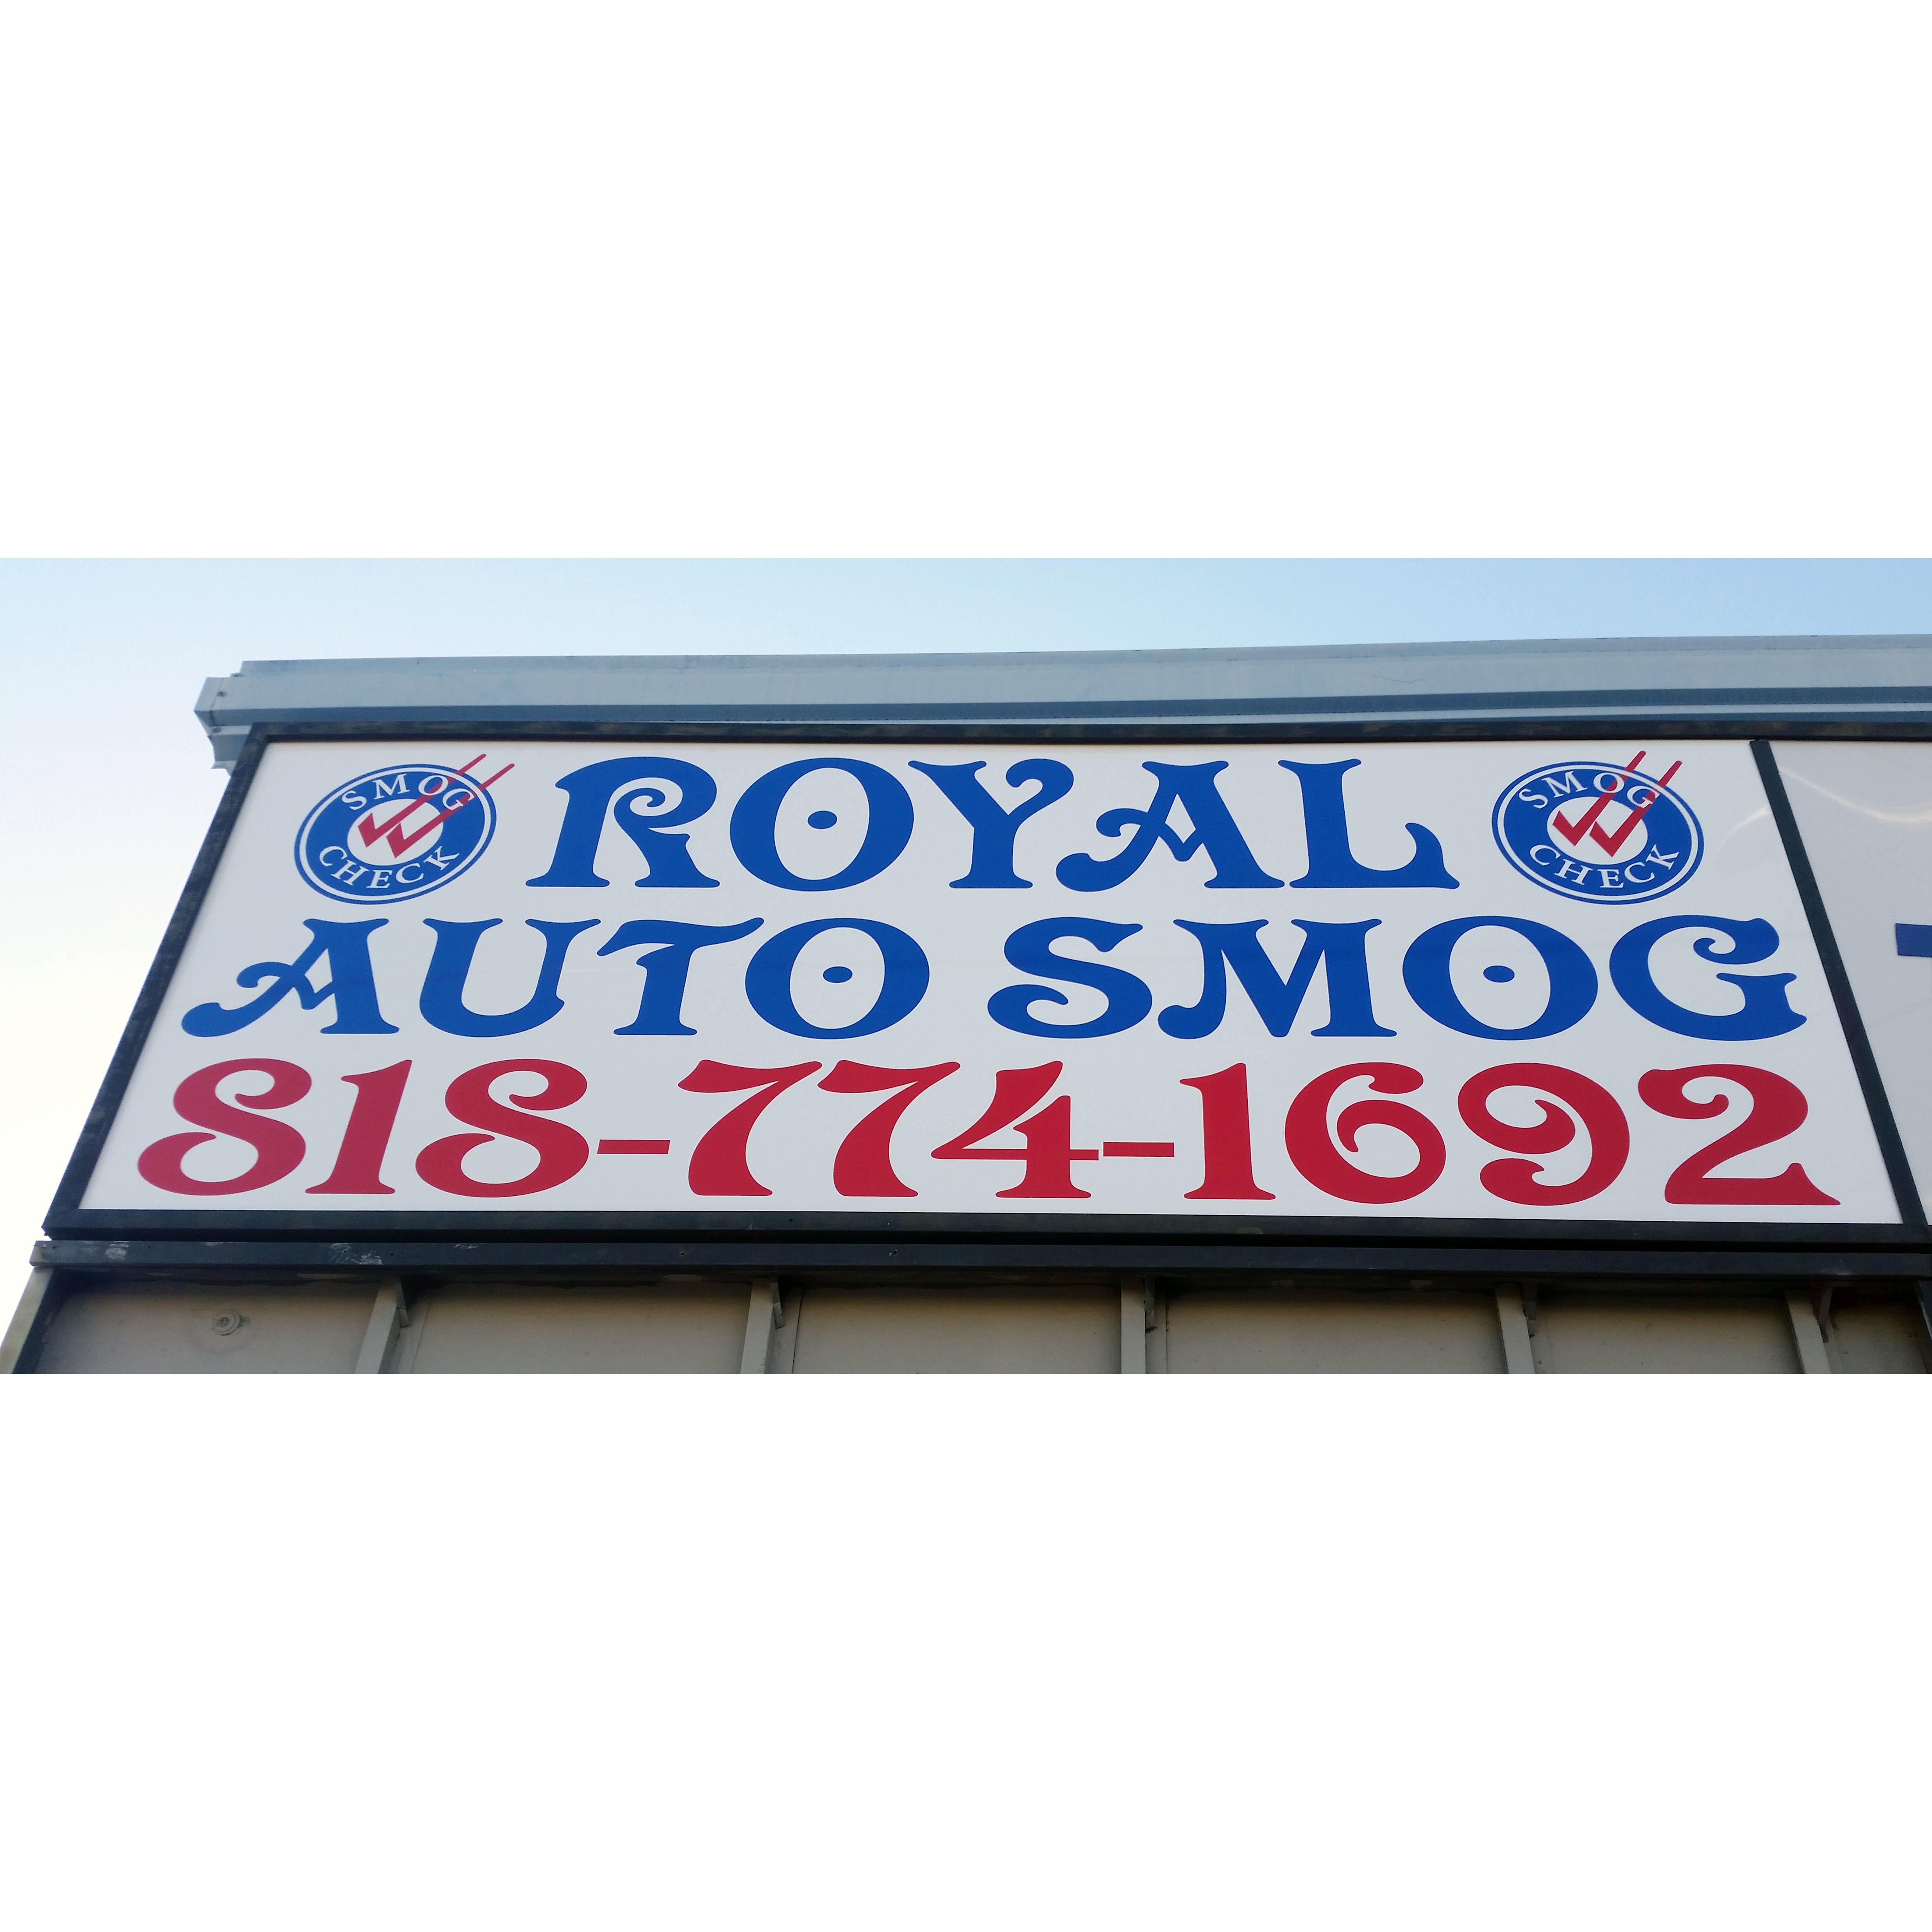 Royal Auto Smog Test Only Reseda